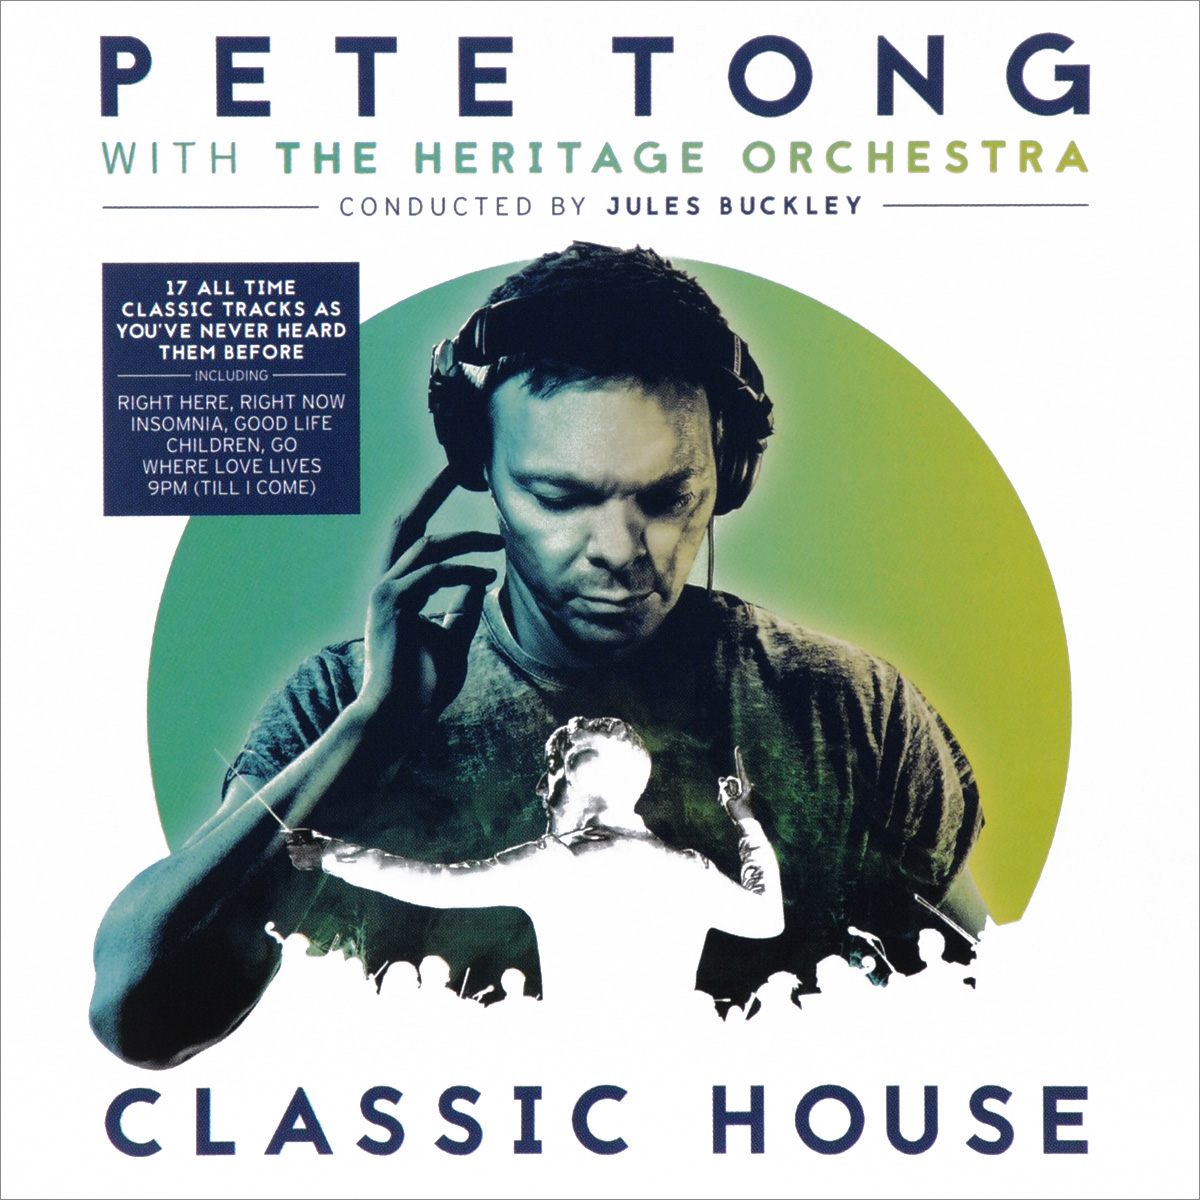 Пит Тонг,Cookie,Jamie Principle,Katy B,Элла Эйр,Джон Ньюман Pete Tong. Classic House vermeiren katy